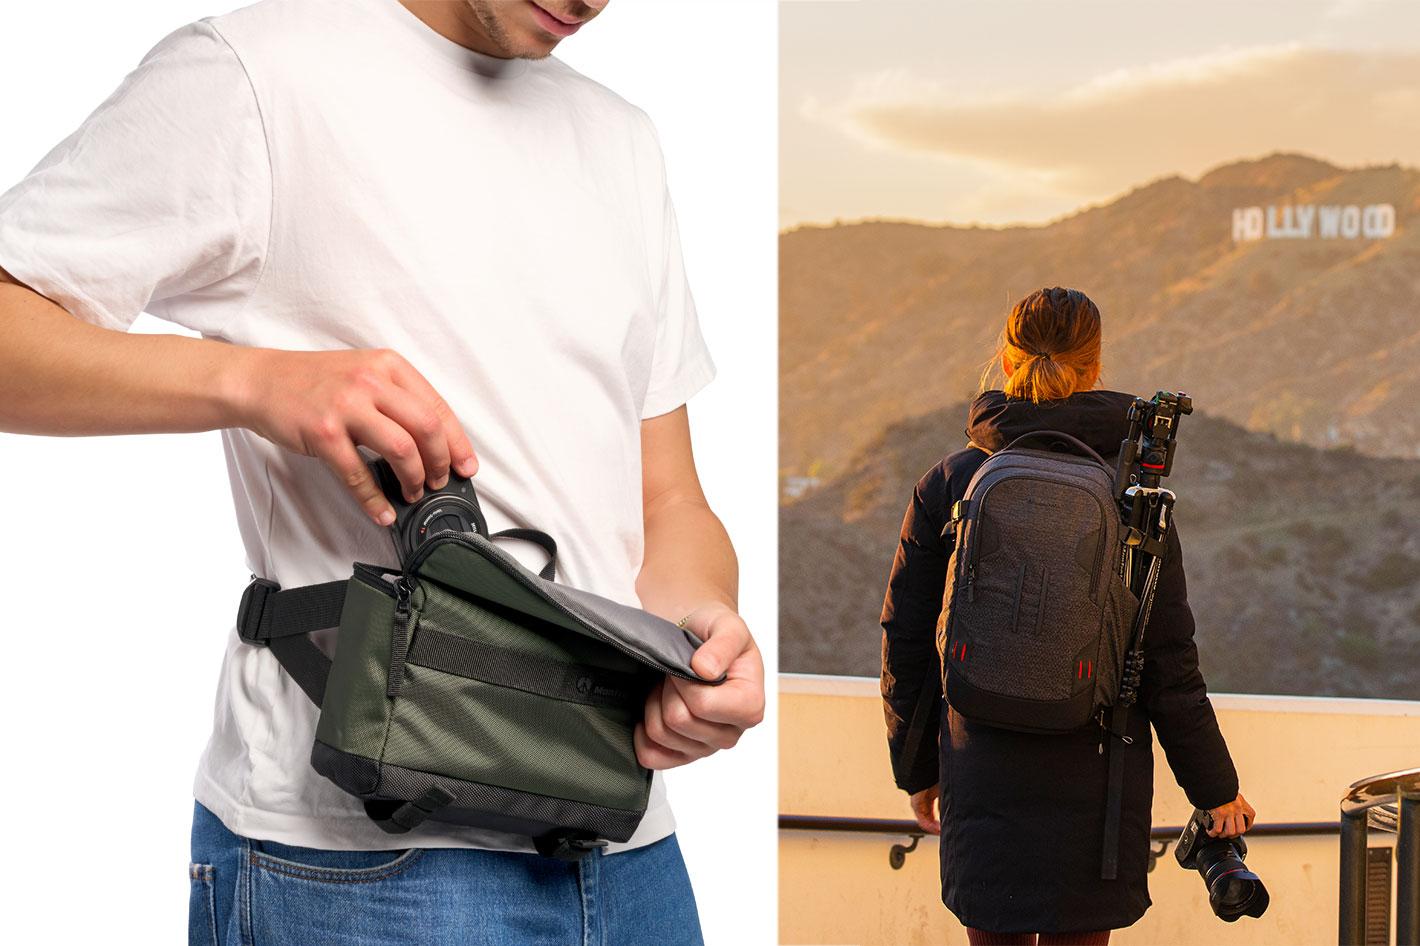 Manfrotto renews its camera bag range